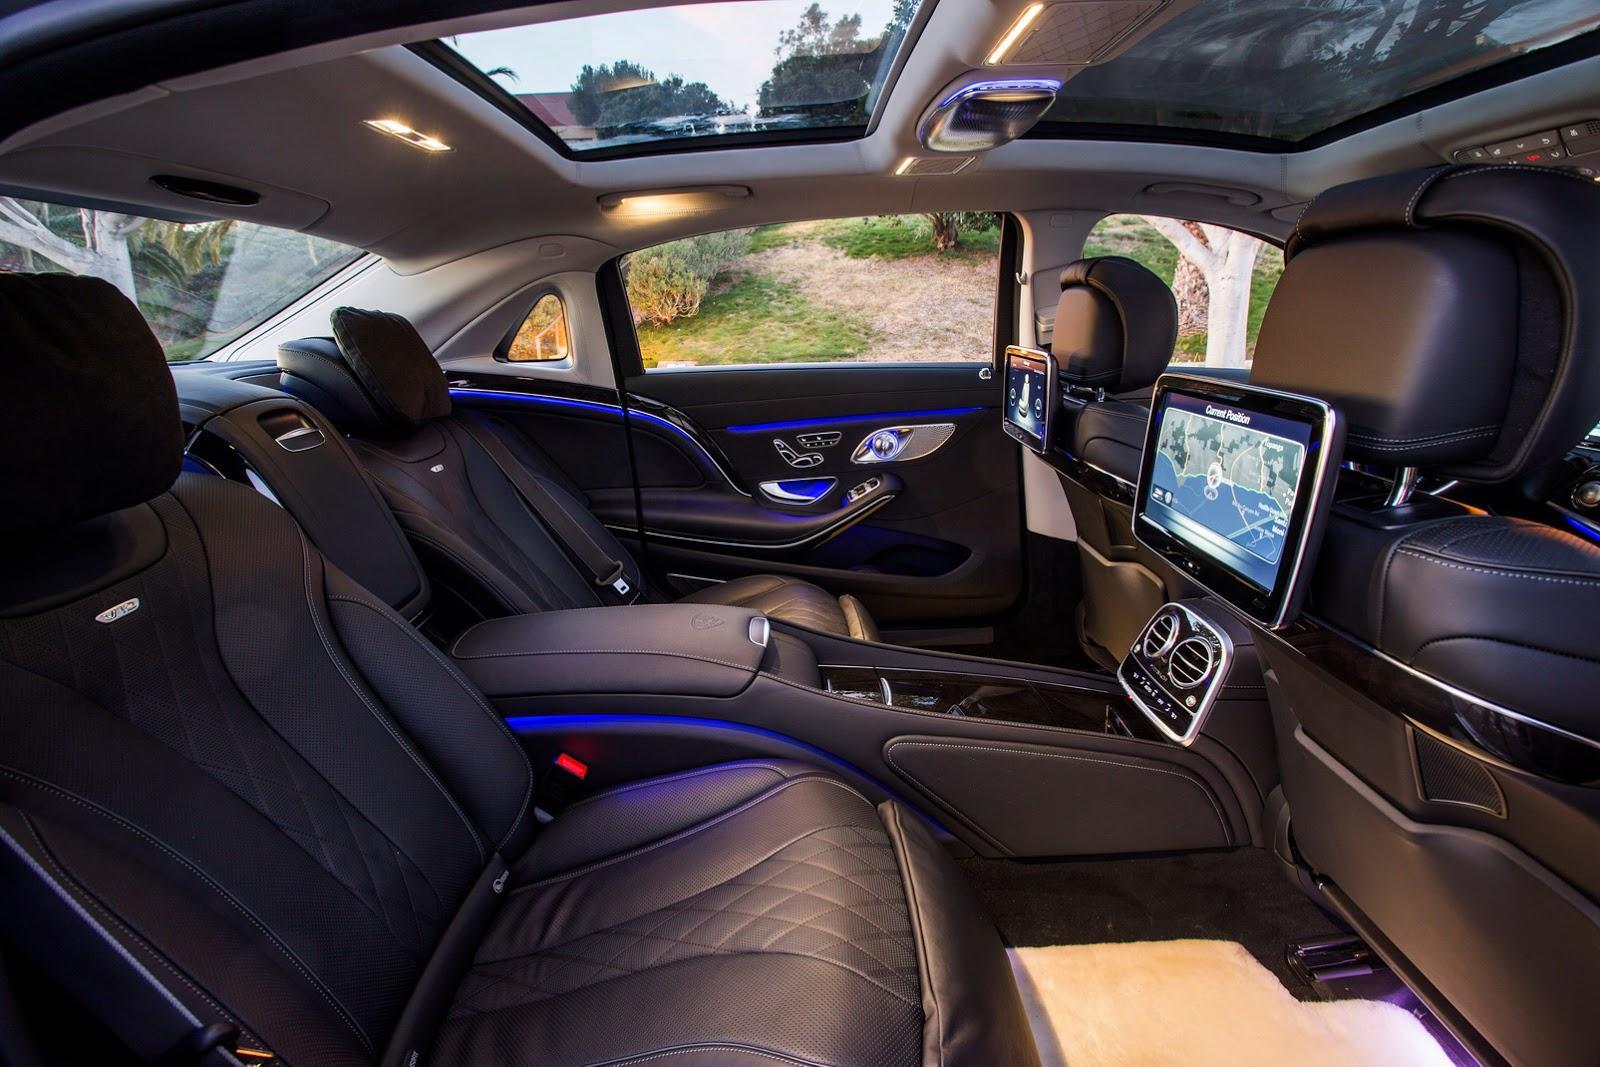 Objavljeni Detalji I Cena Za Mercedes Maybach S600 Auto